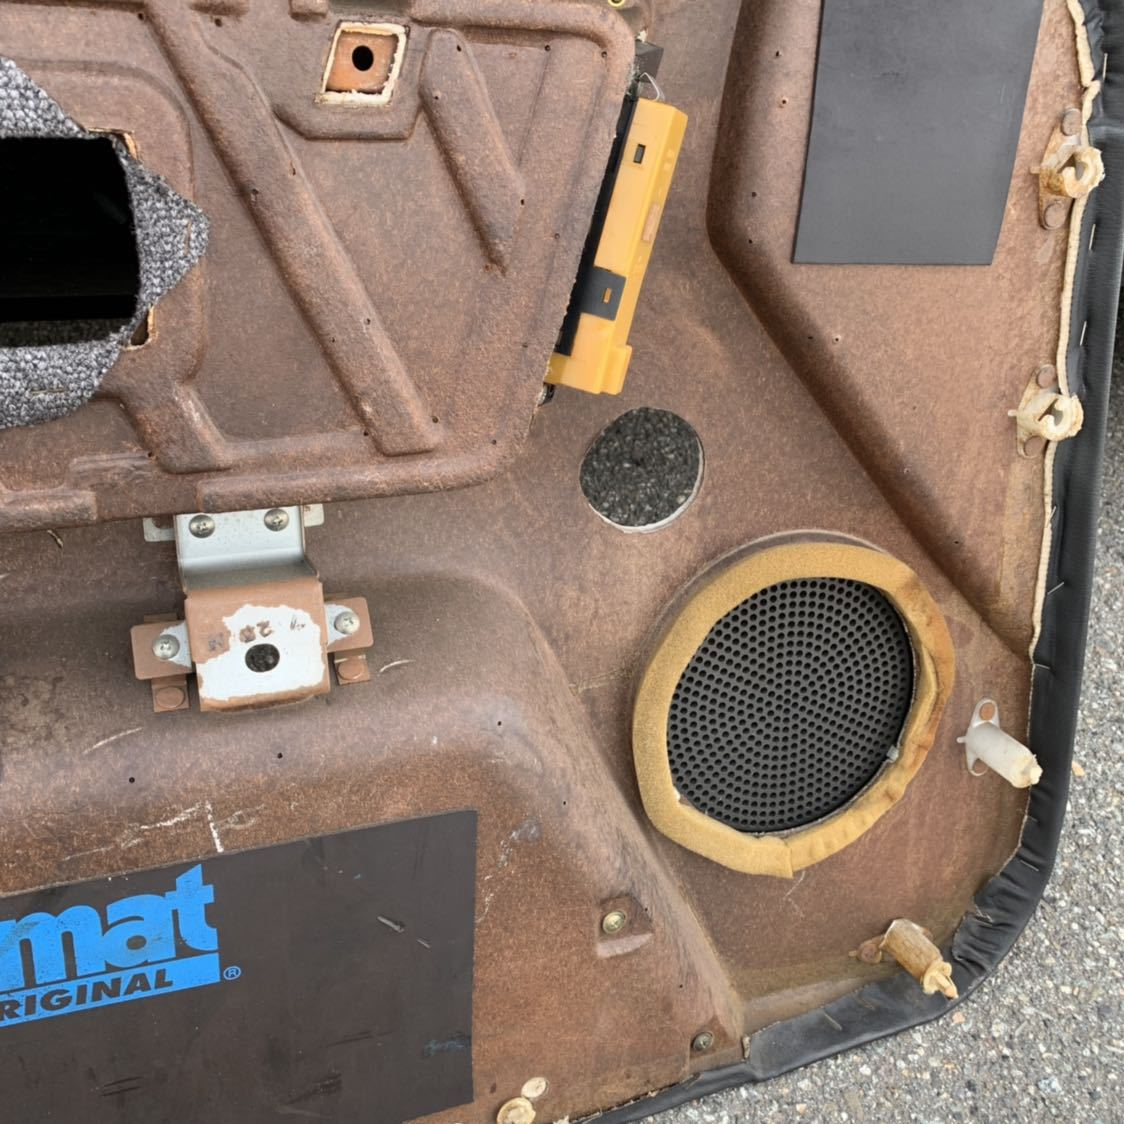 HR31 R31 スカイライン 2ドア GTS-R 右側 ドア内張り 穴あけ有り 限定車 ニスモ仕様_画像8